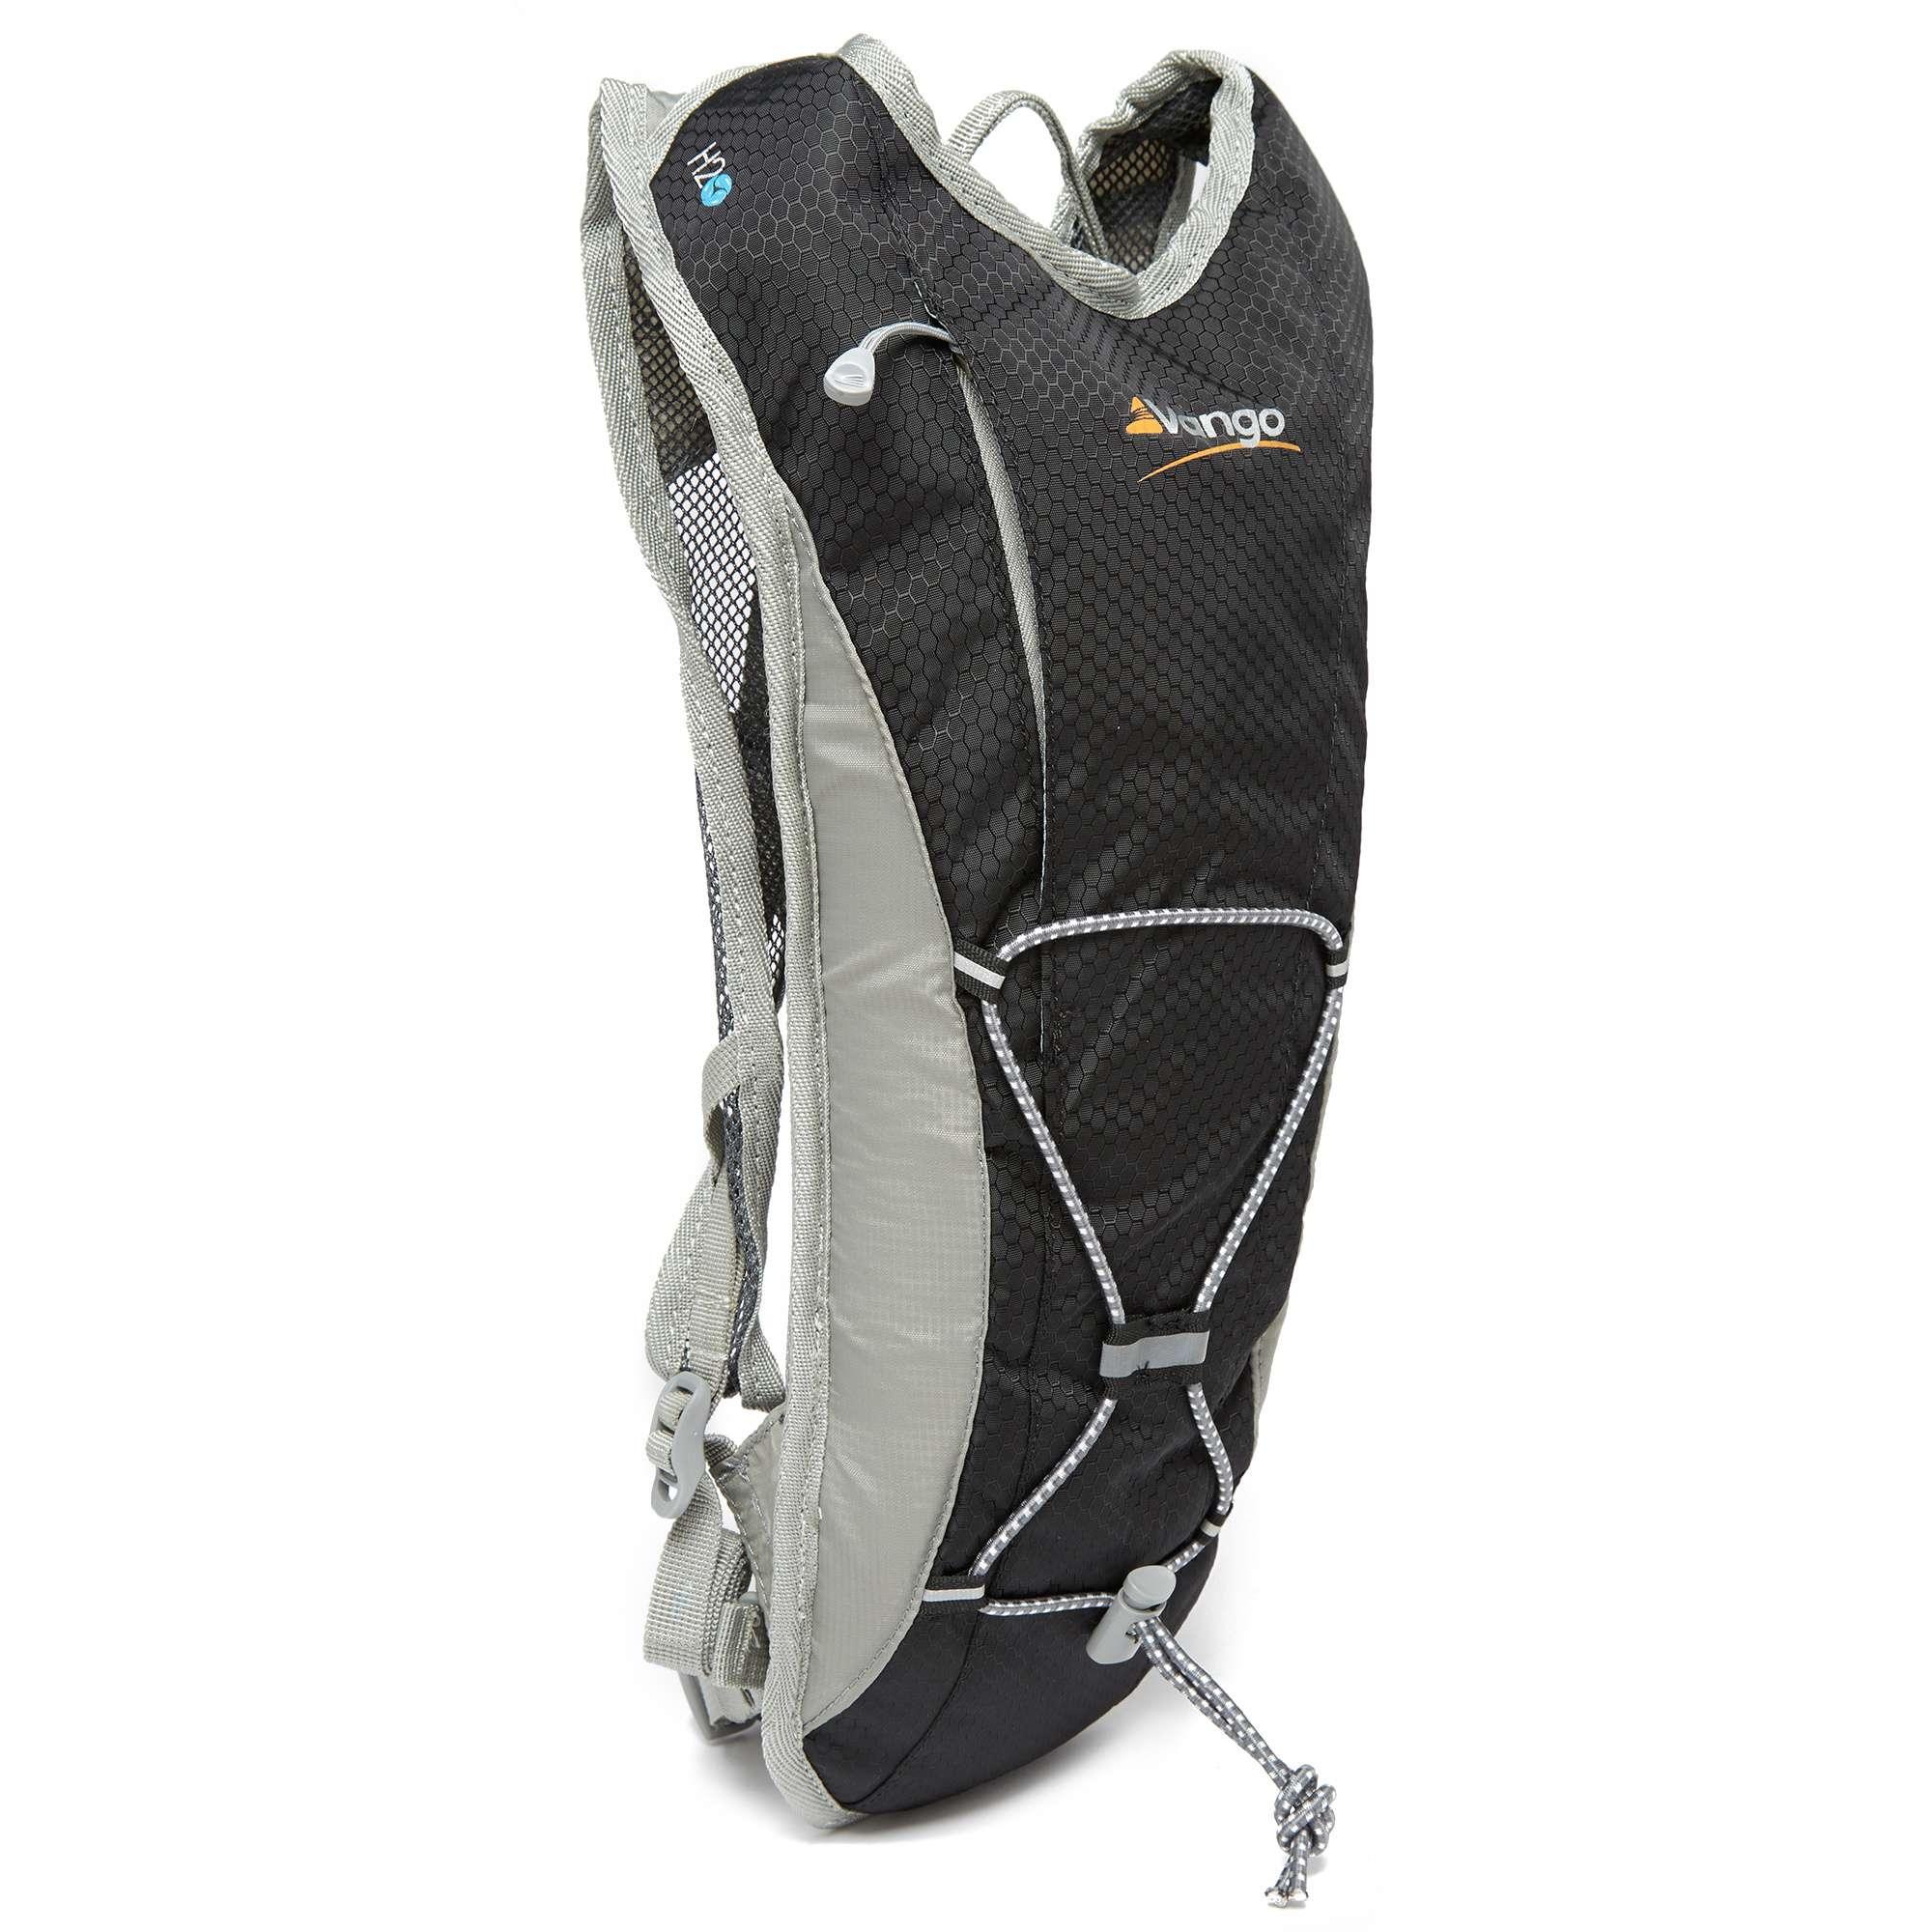 VANGO Sprint 3 Hydration Pack